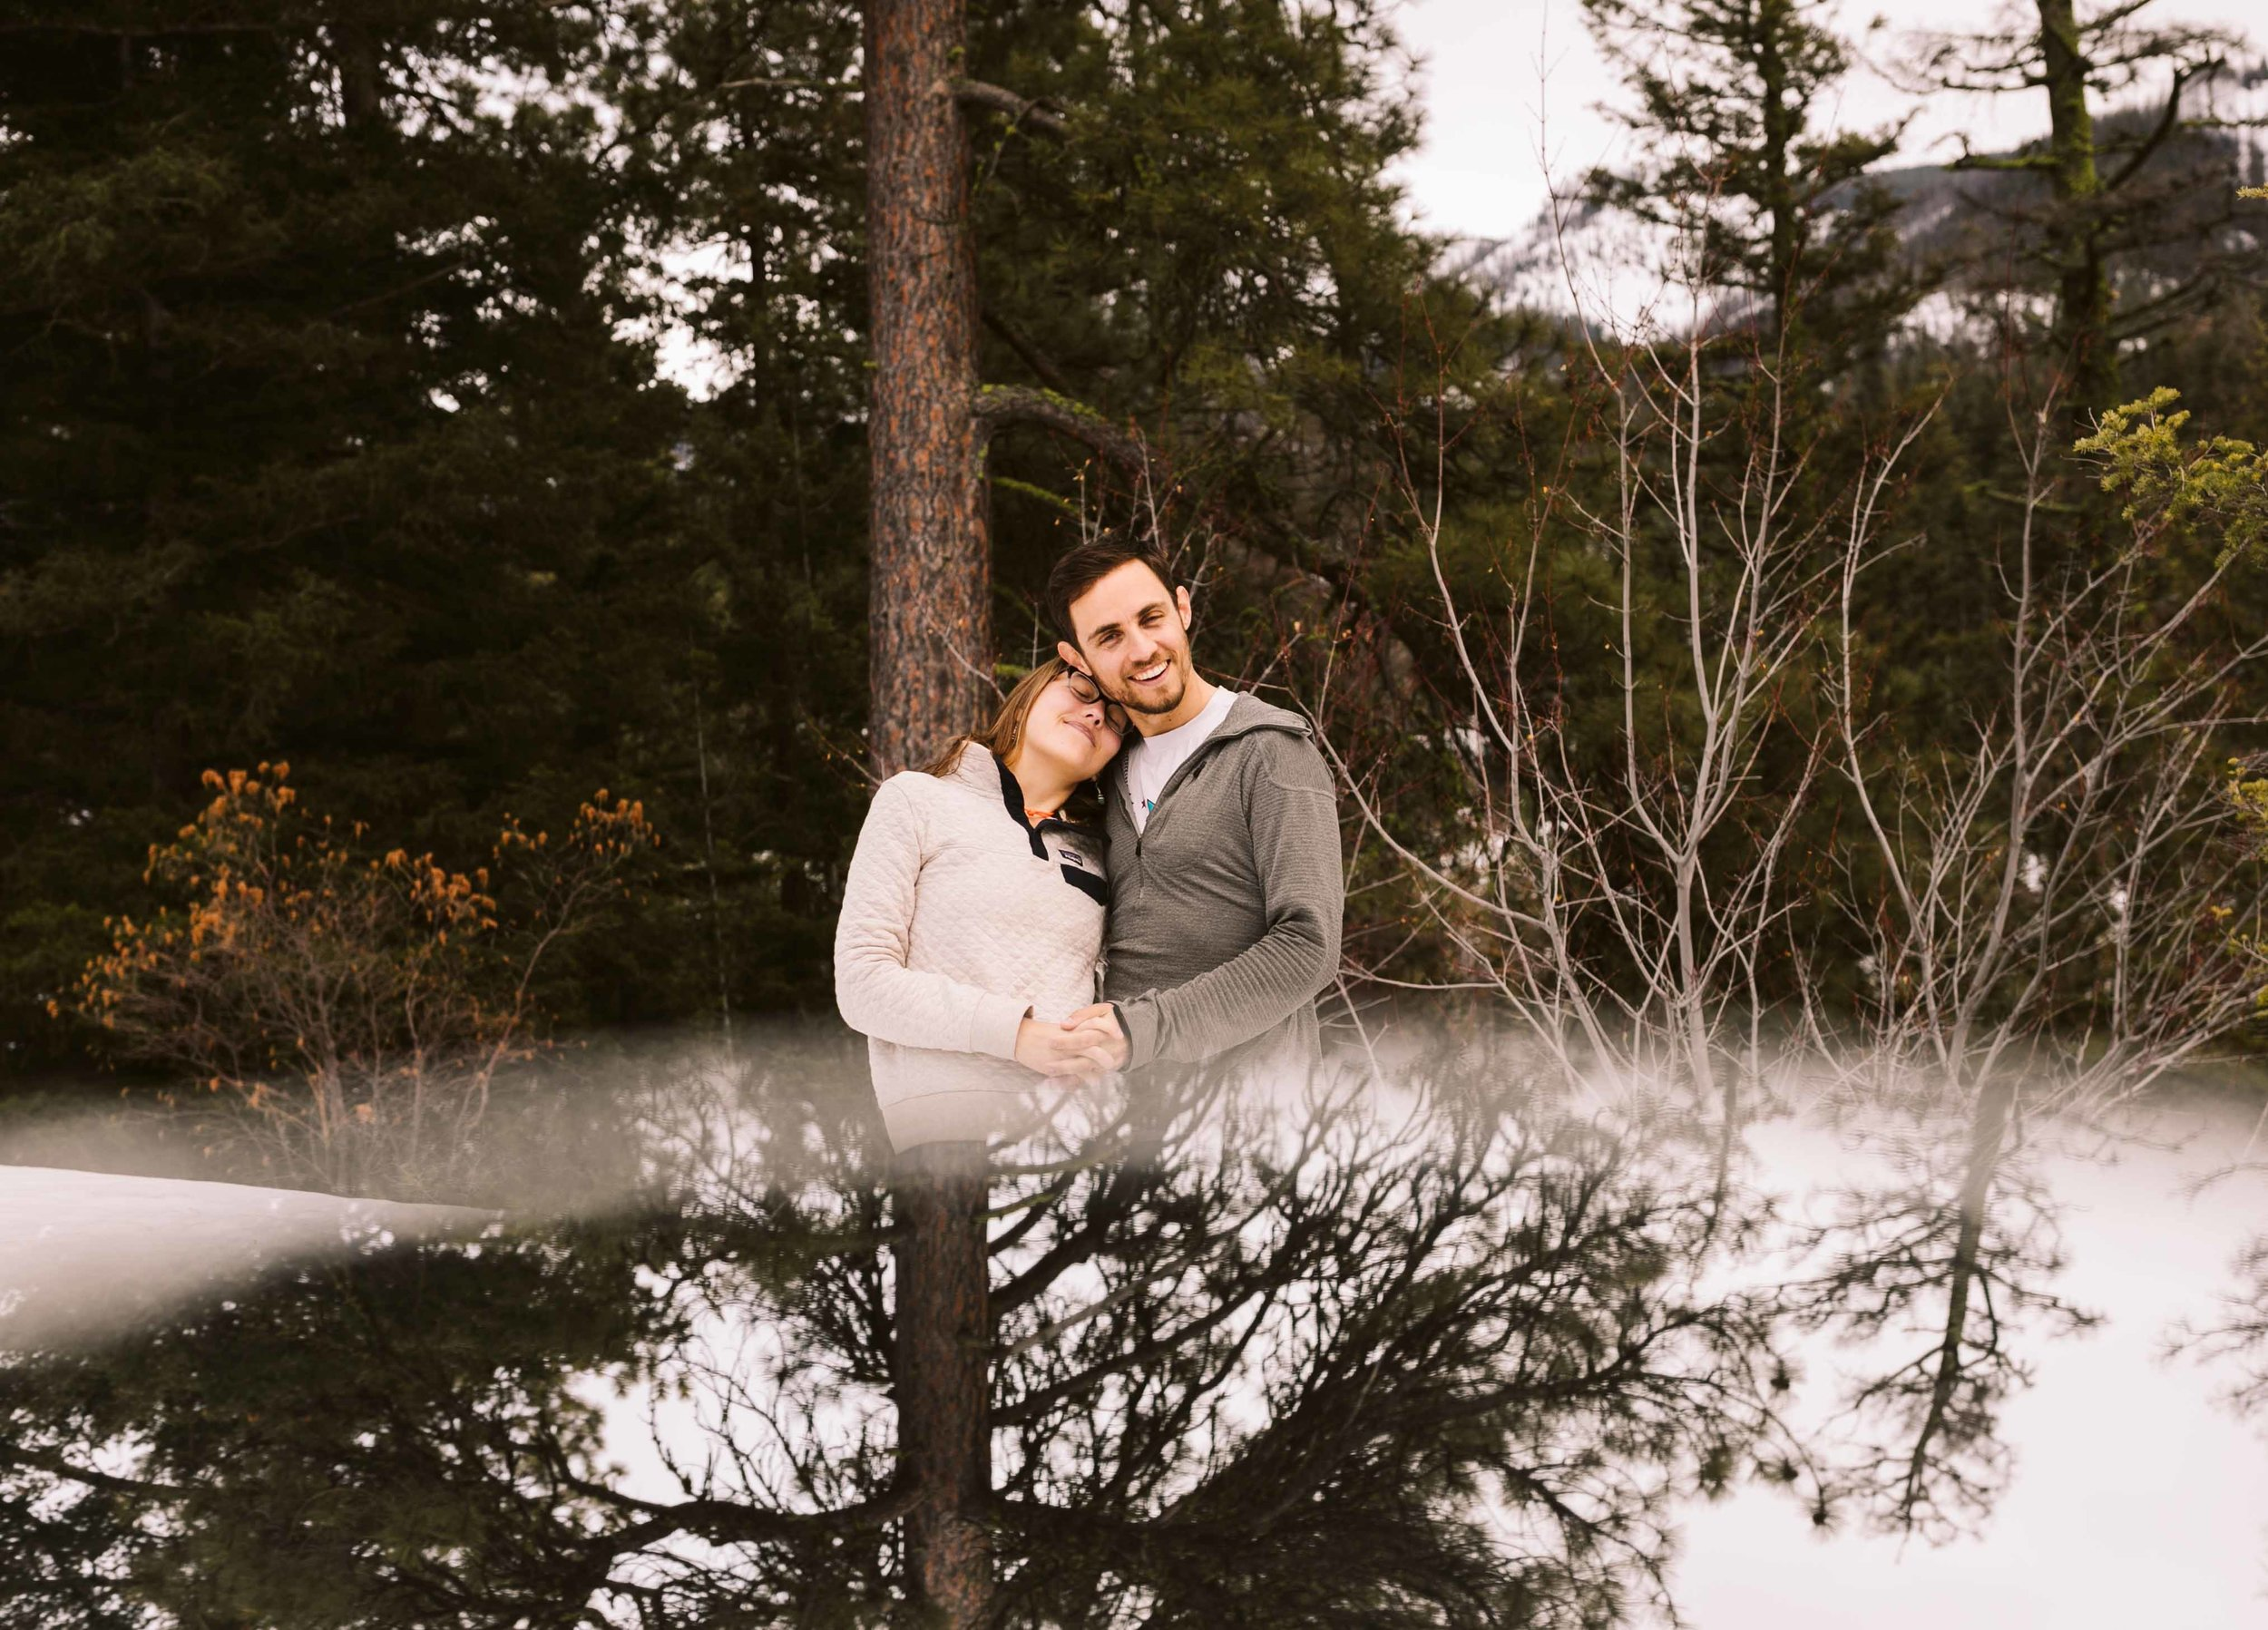 snowshoe-engagement-photos-32.jpg